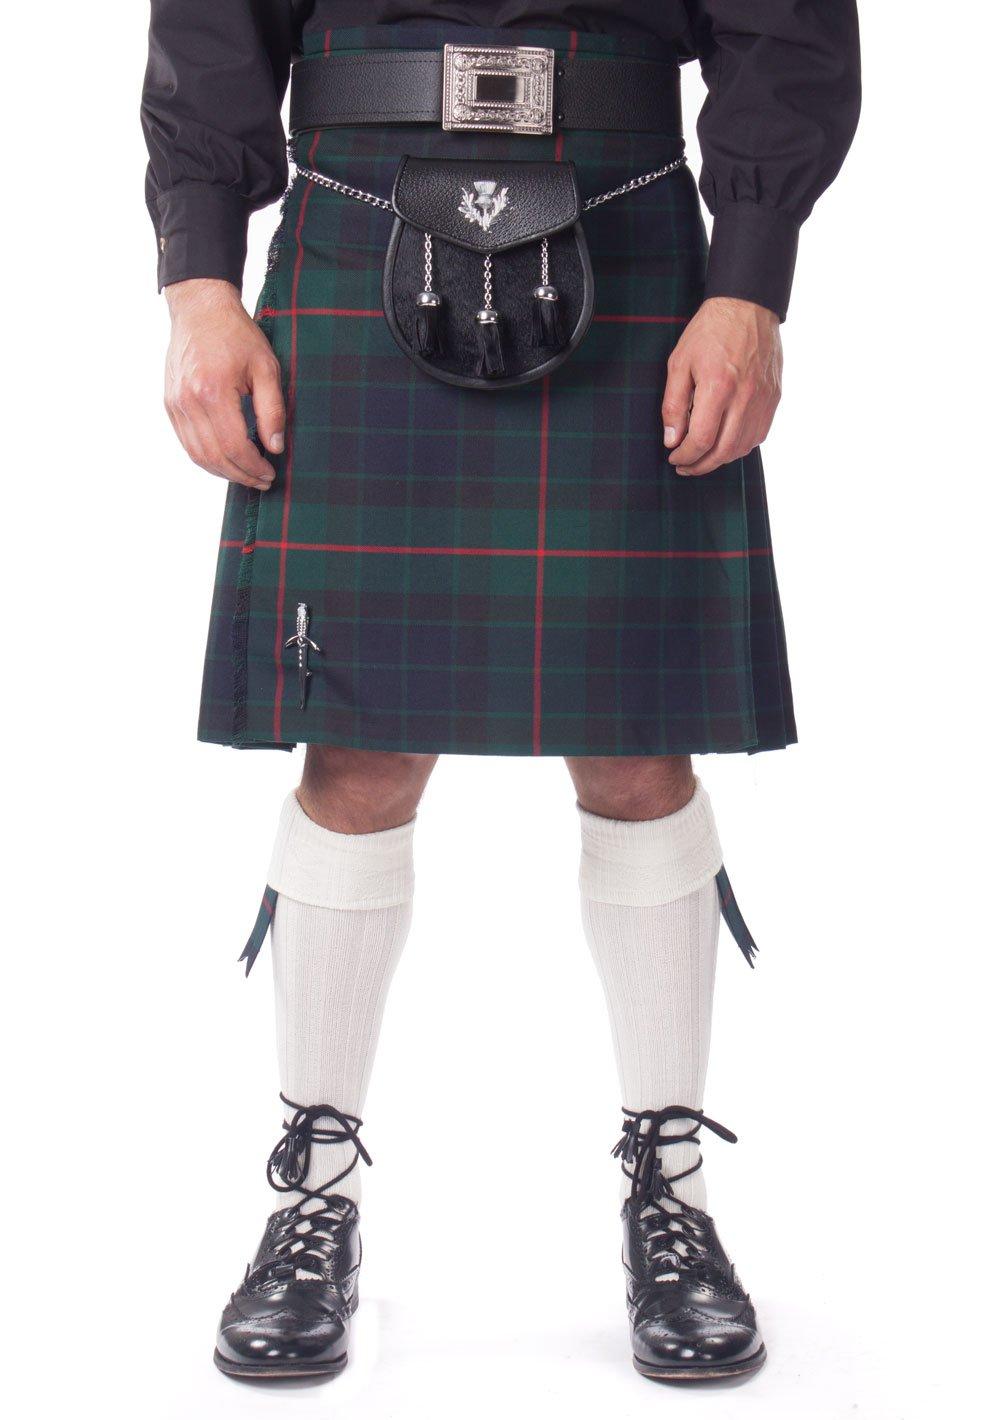 Kilt Society Mens 7 Piece Semi Dress Kilt Outfit- Gunn Tartan with White Hose 30'' to 34''